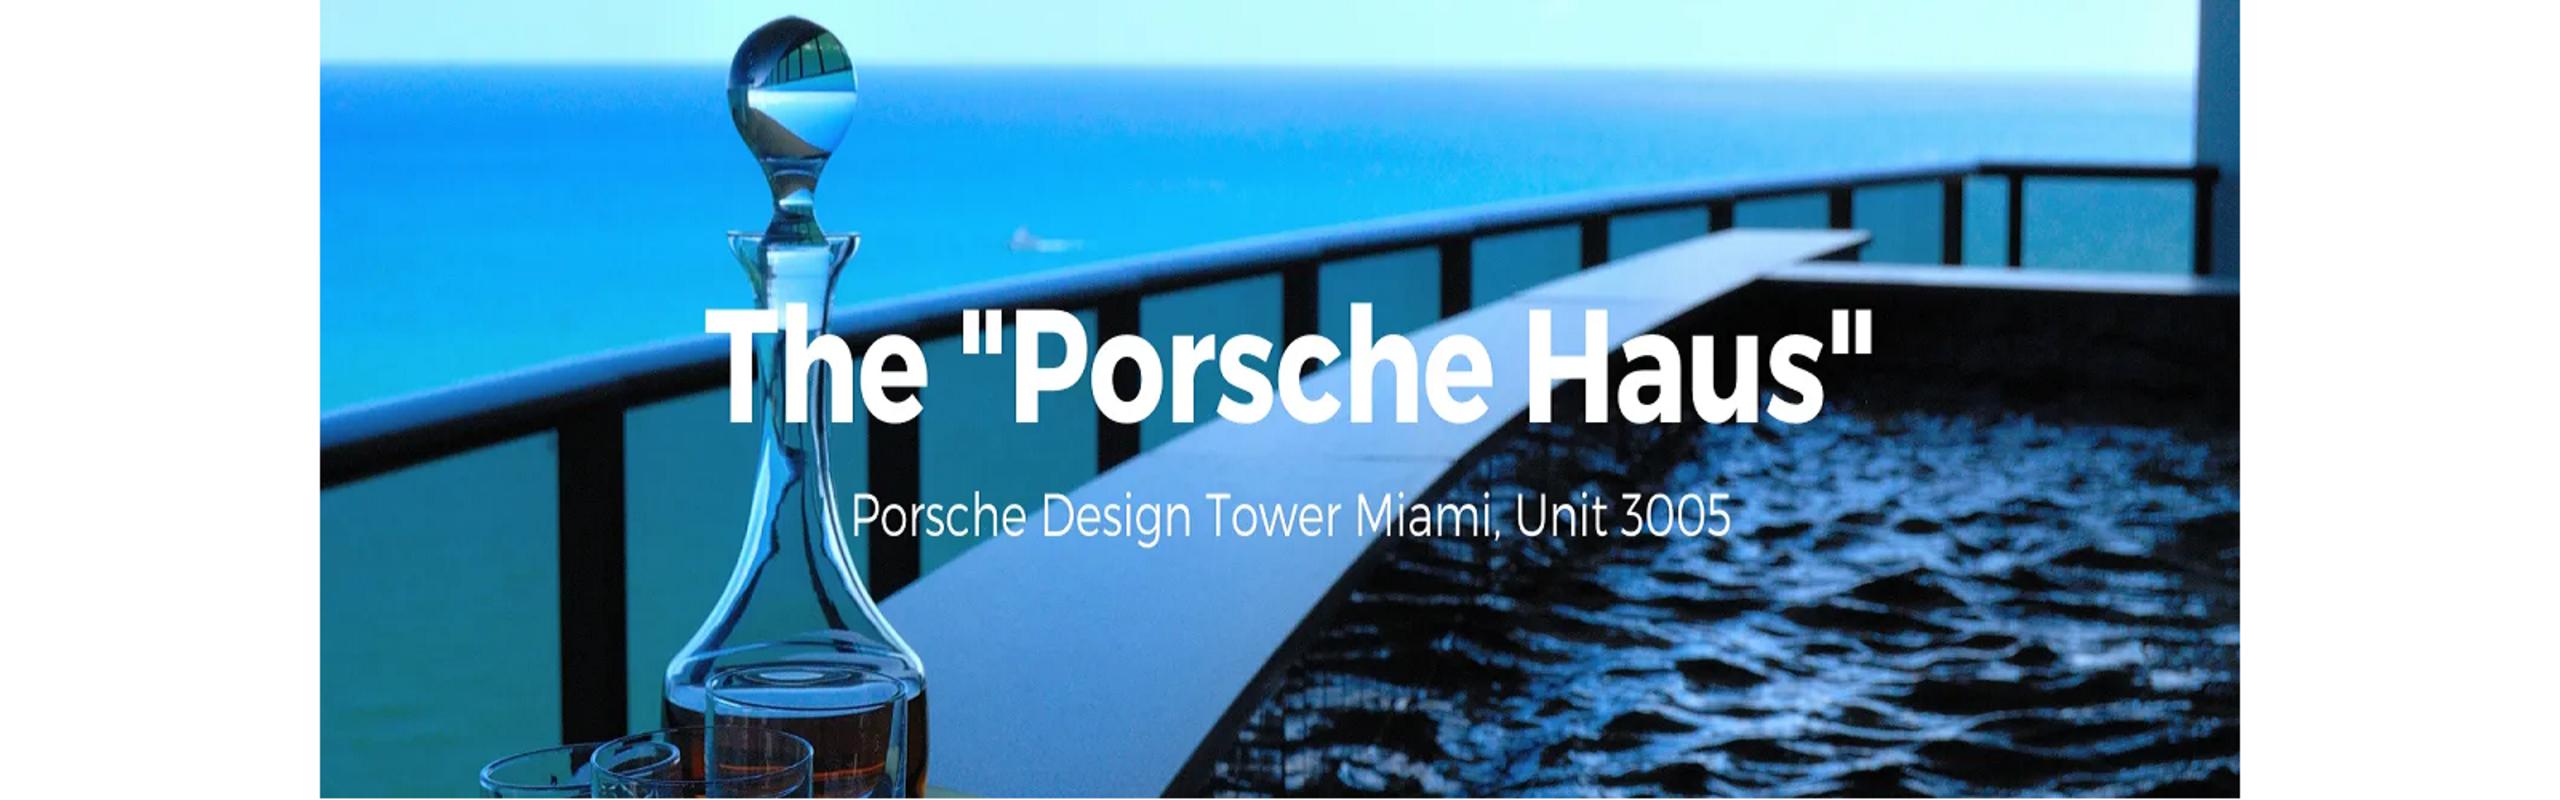 "The ""Porsche Haus"" at Porsche Design Tower Miami."